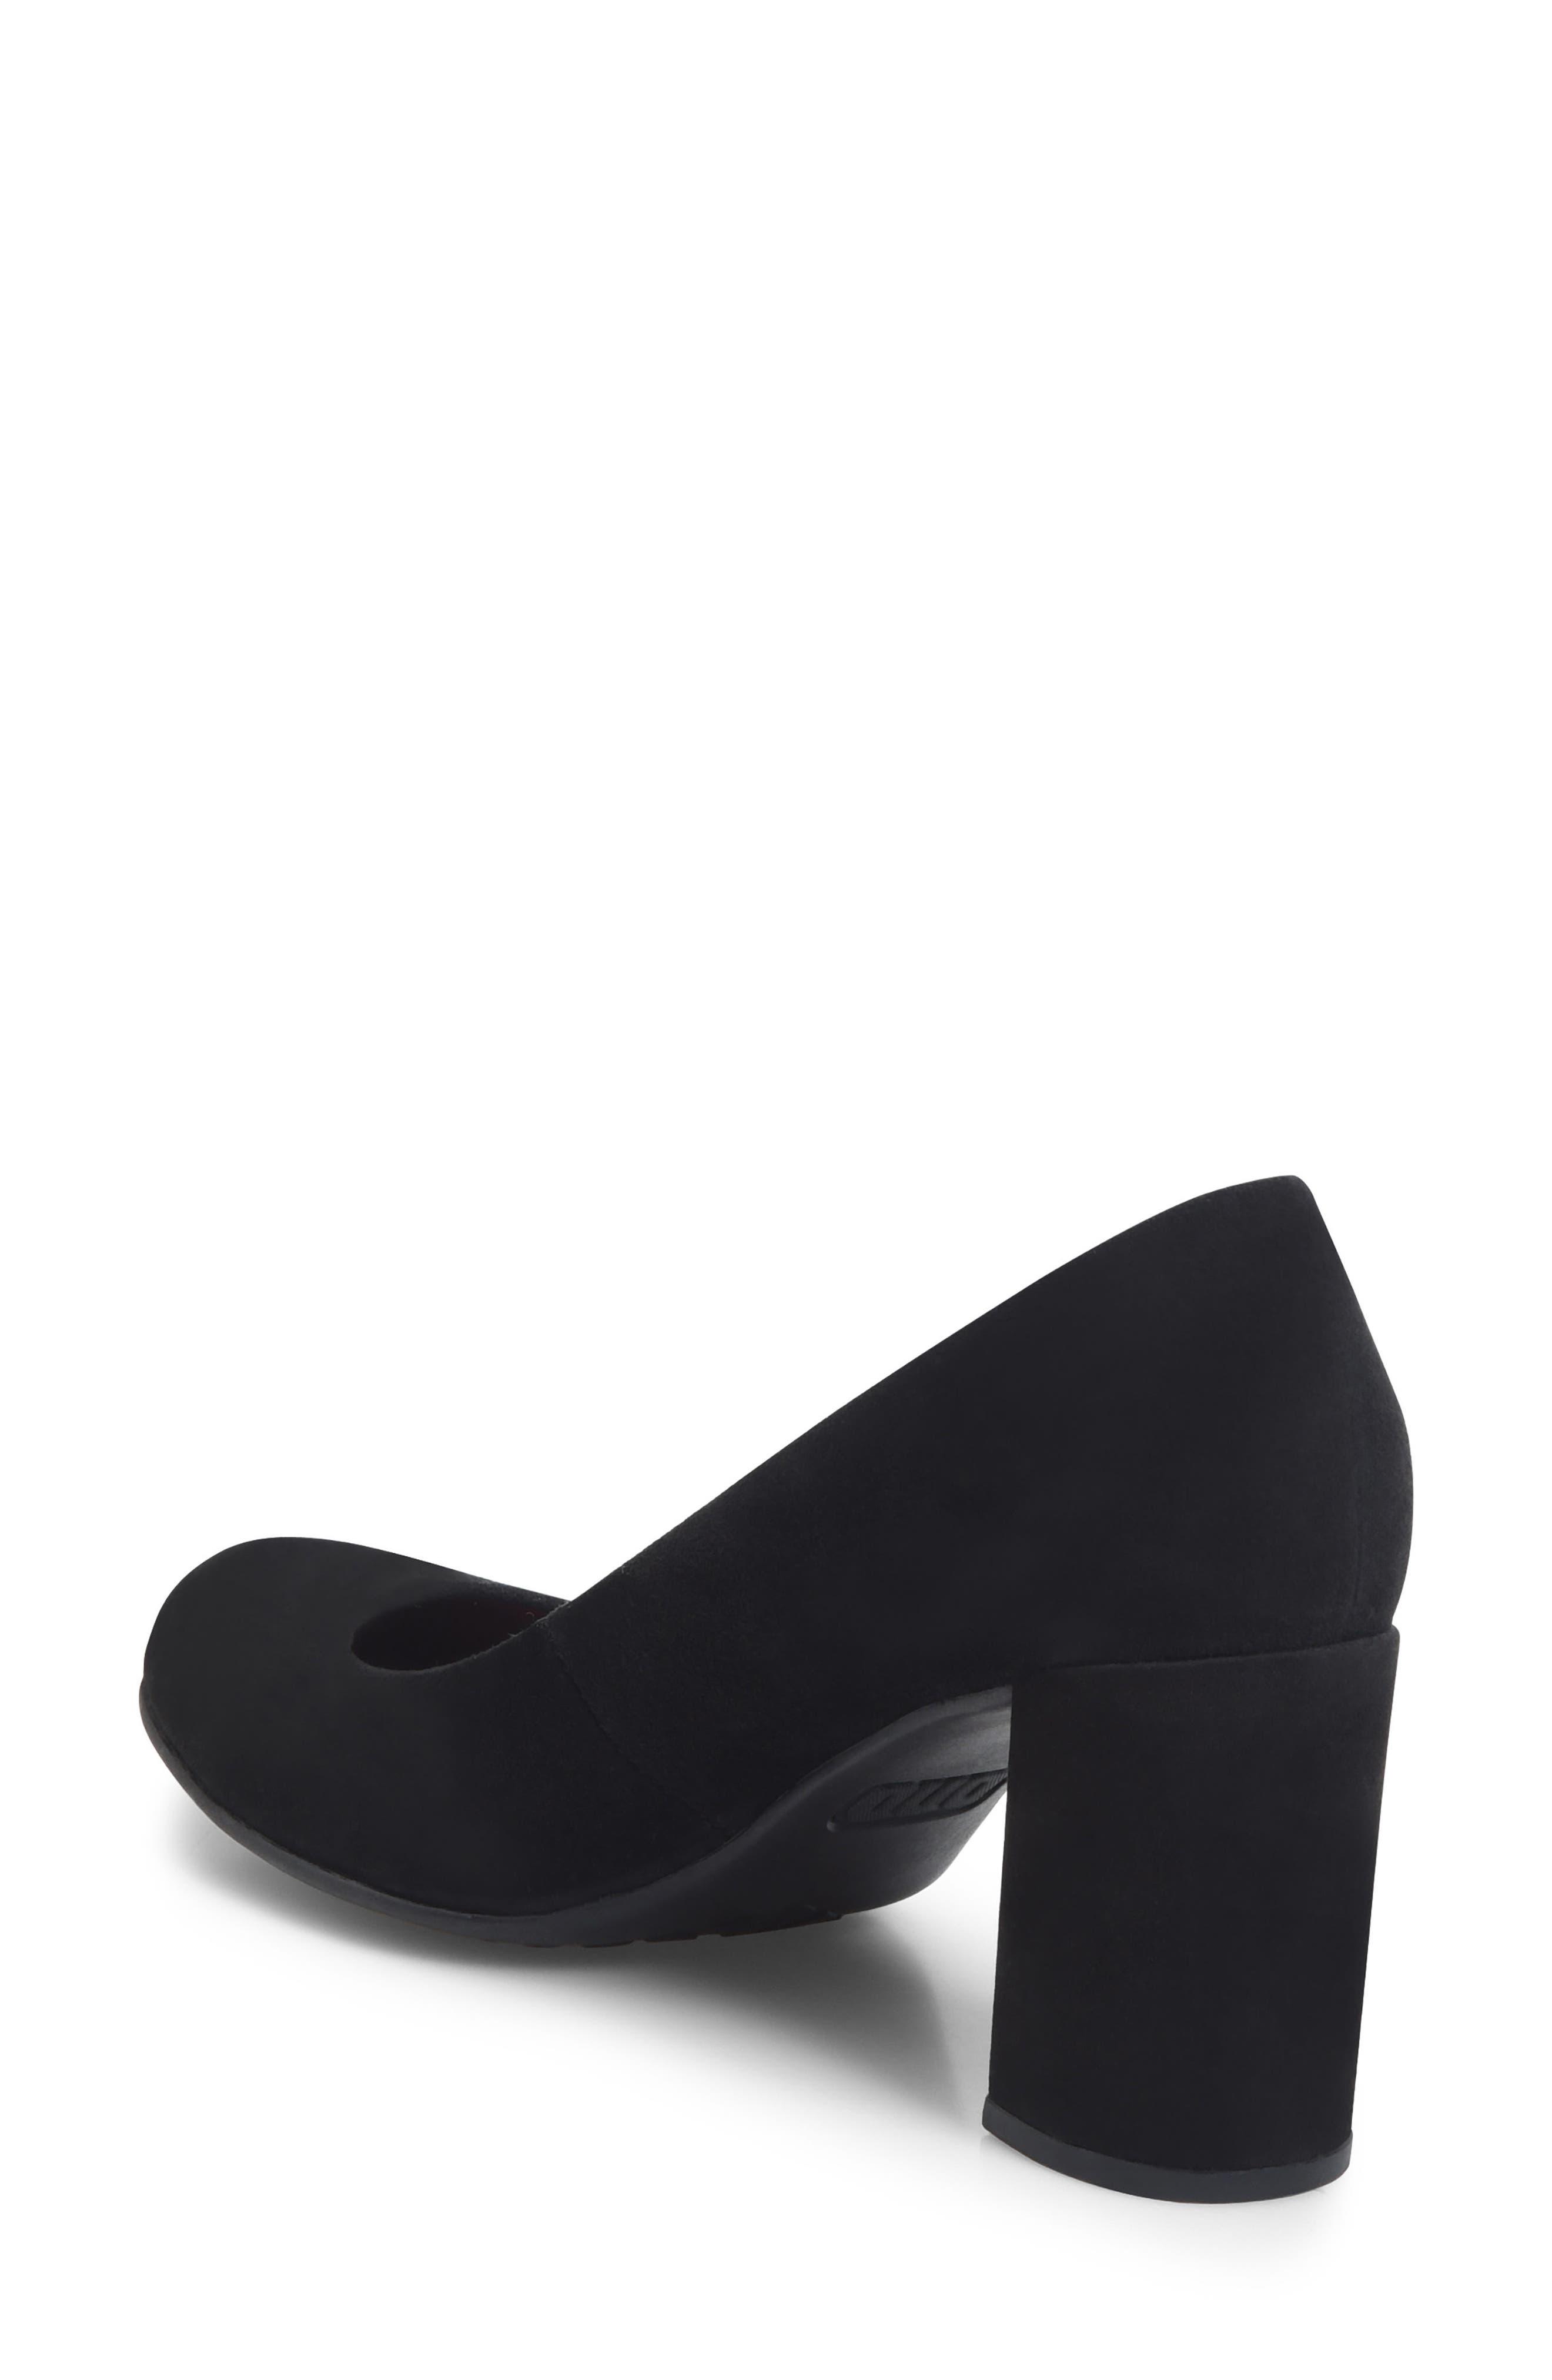 Alpena Block Heel Pump,                             Alternate thumbnail 2, color,                             Black Suede